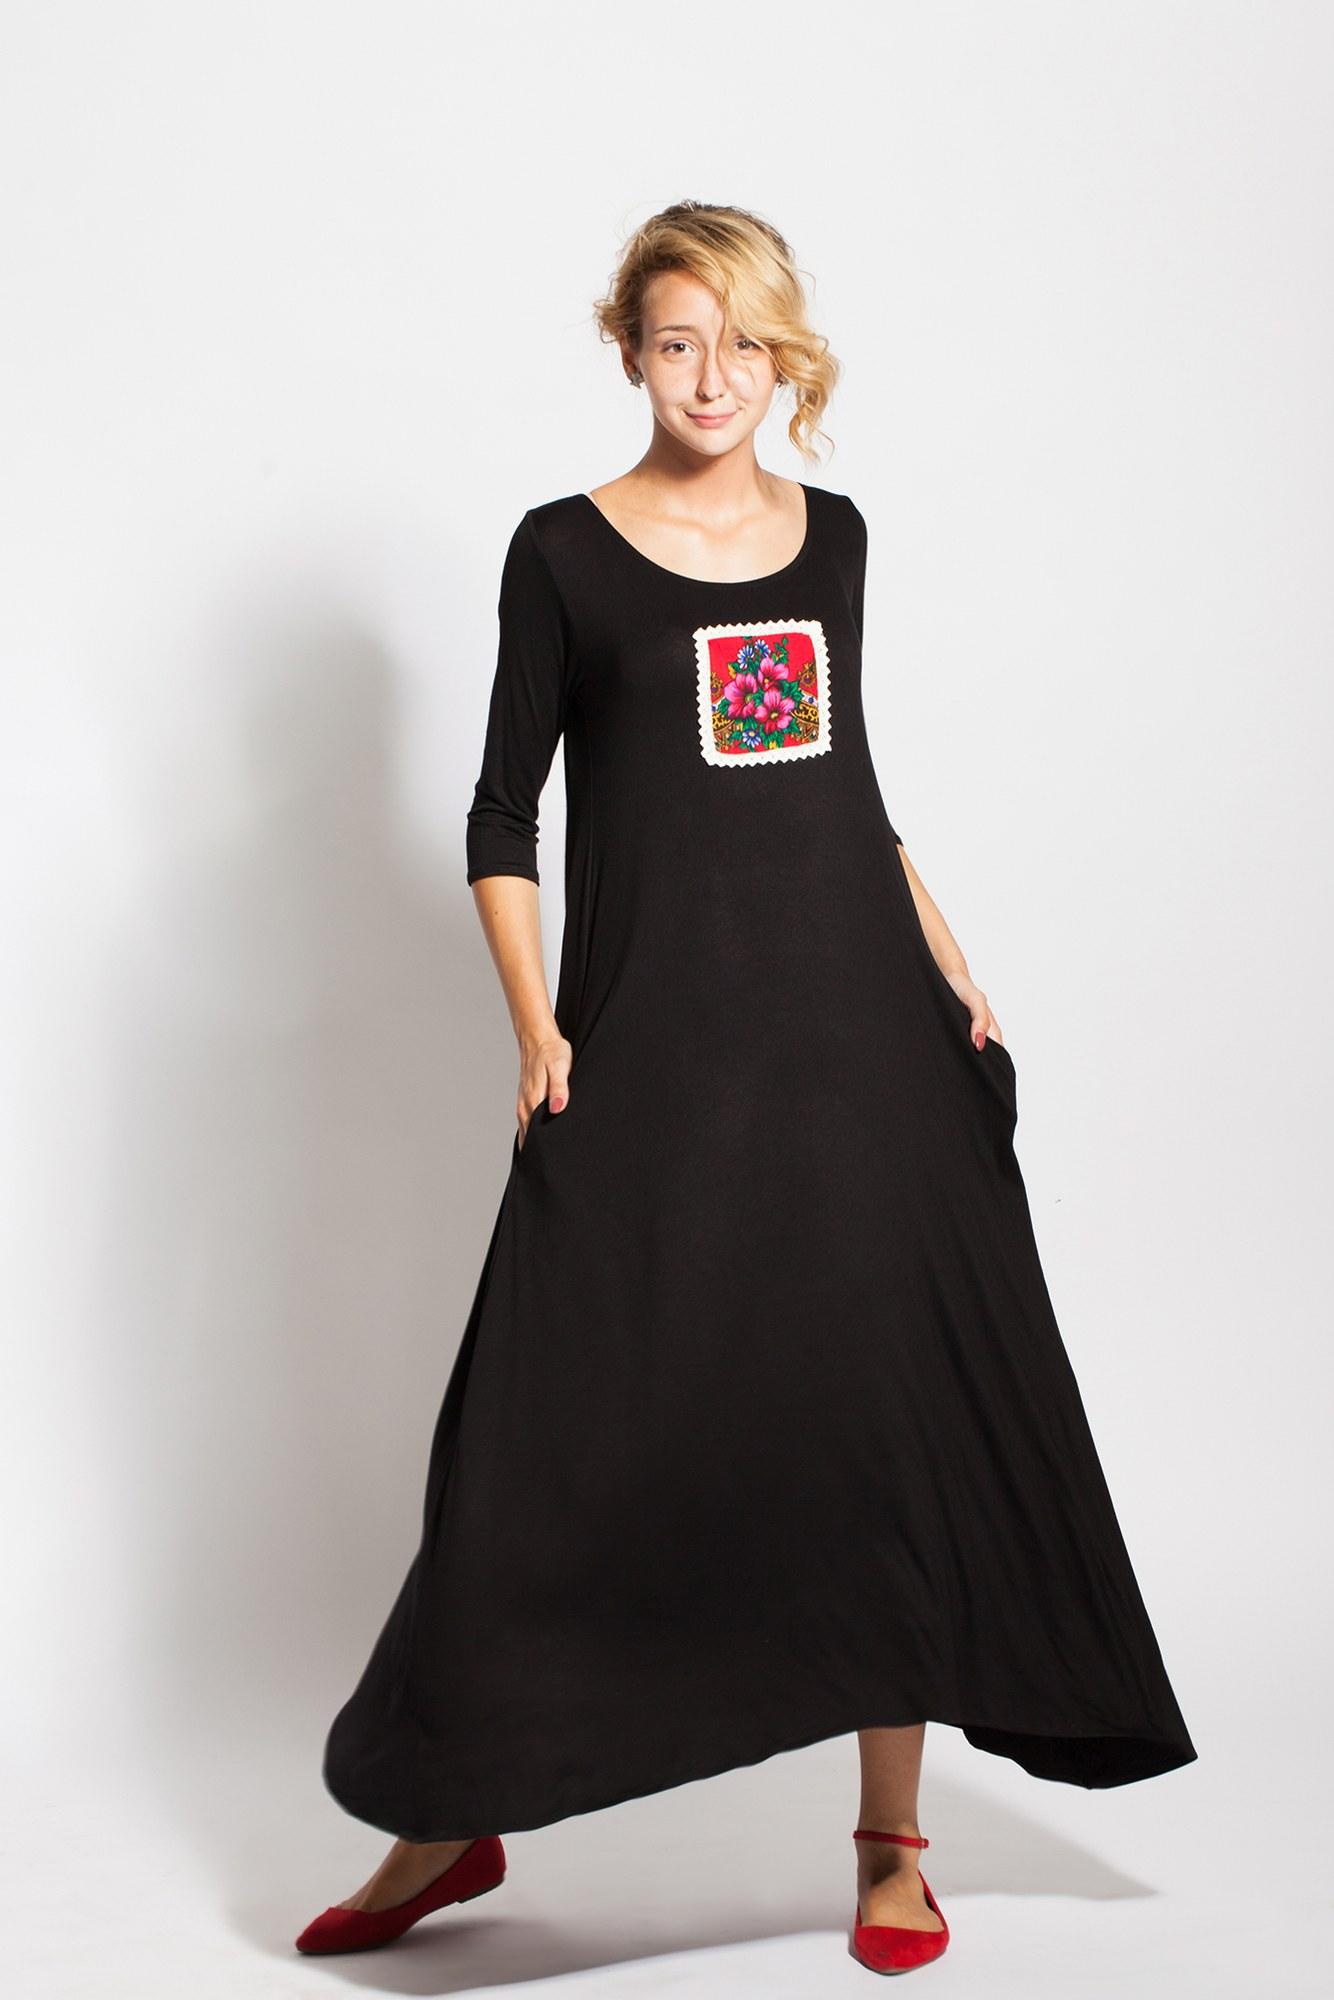 Rochie neagra lunga Mada cu aplicatie traditonala